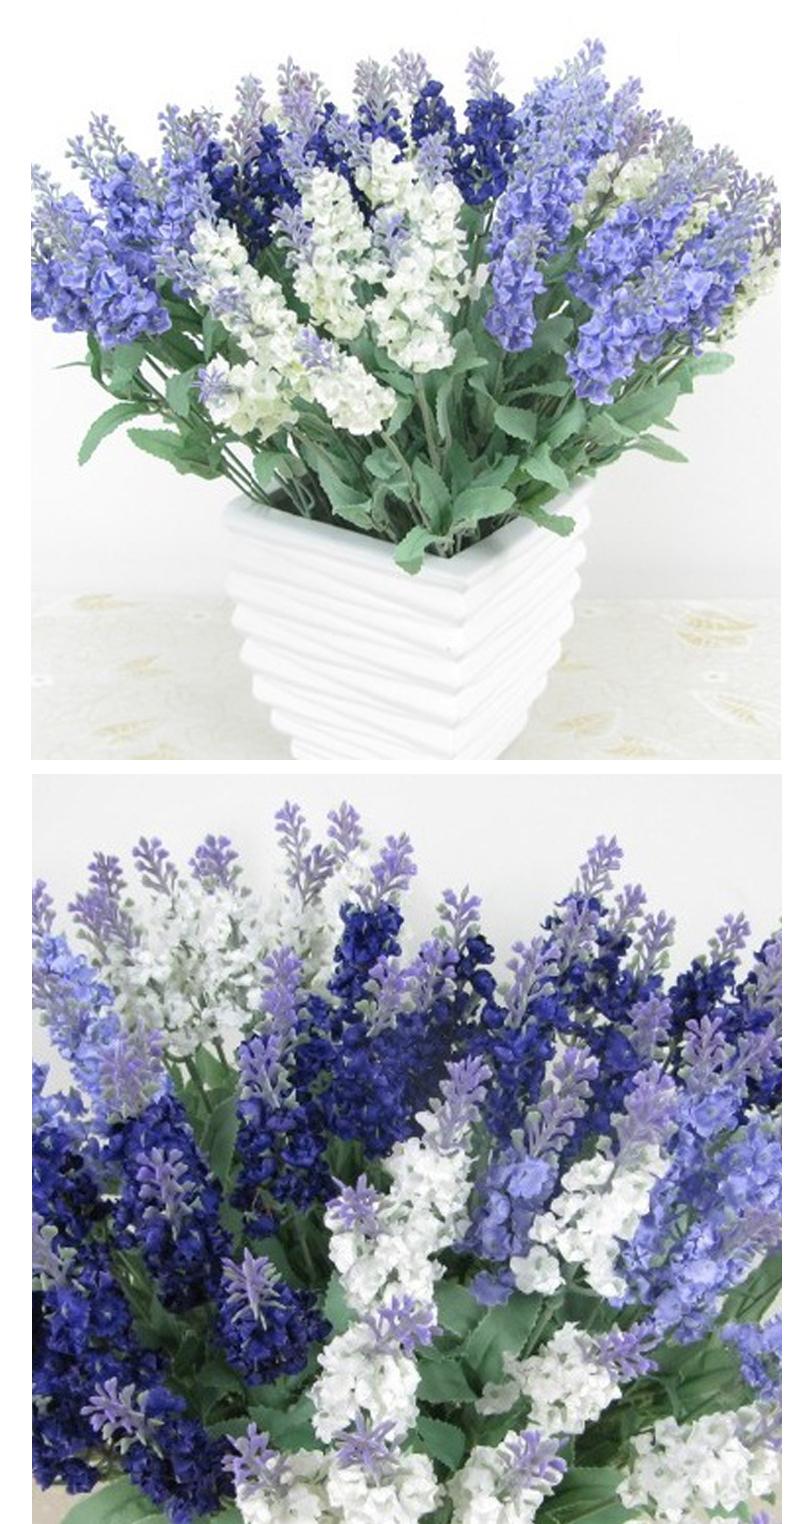 Shimzh Bulk Artificial Lavender Flowers For Wedding 4pcslot Love